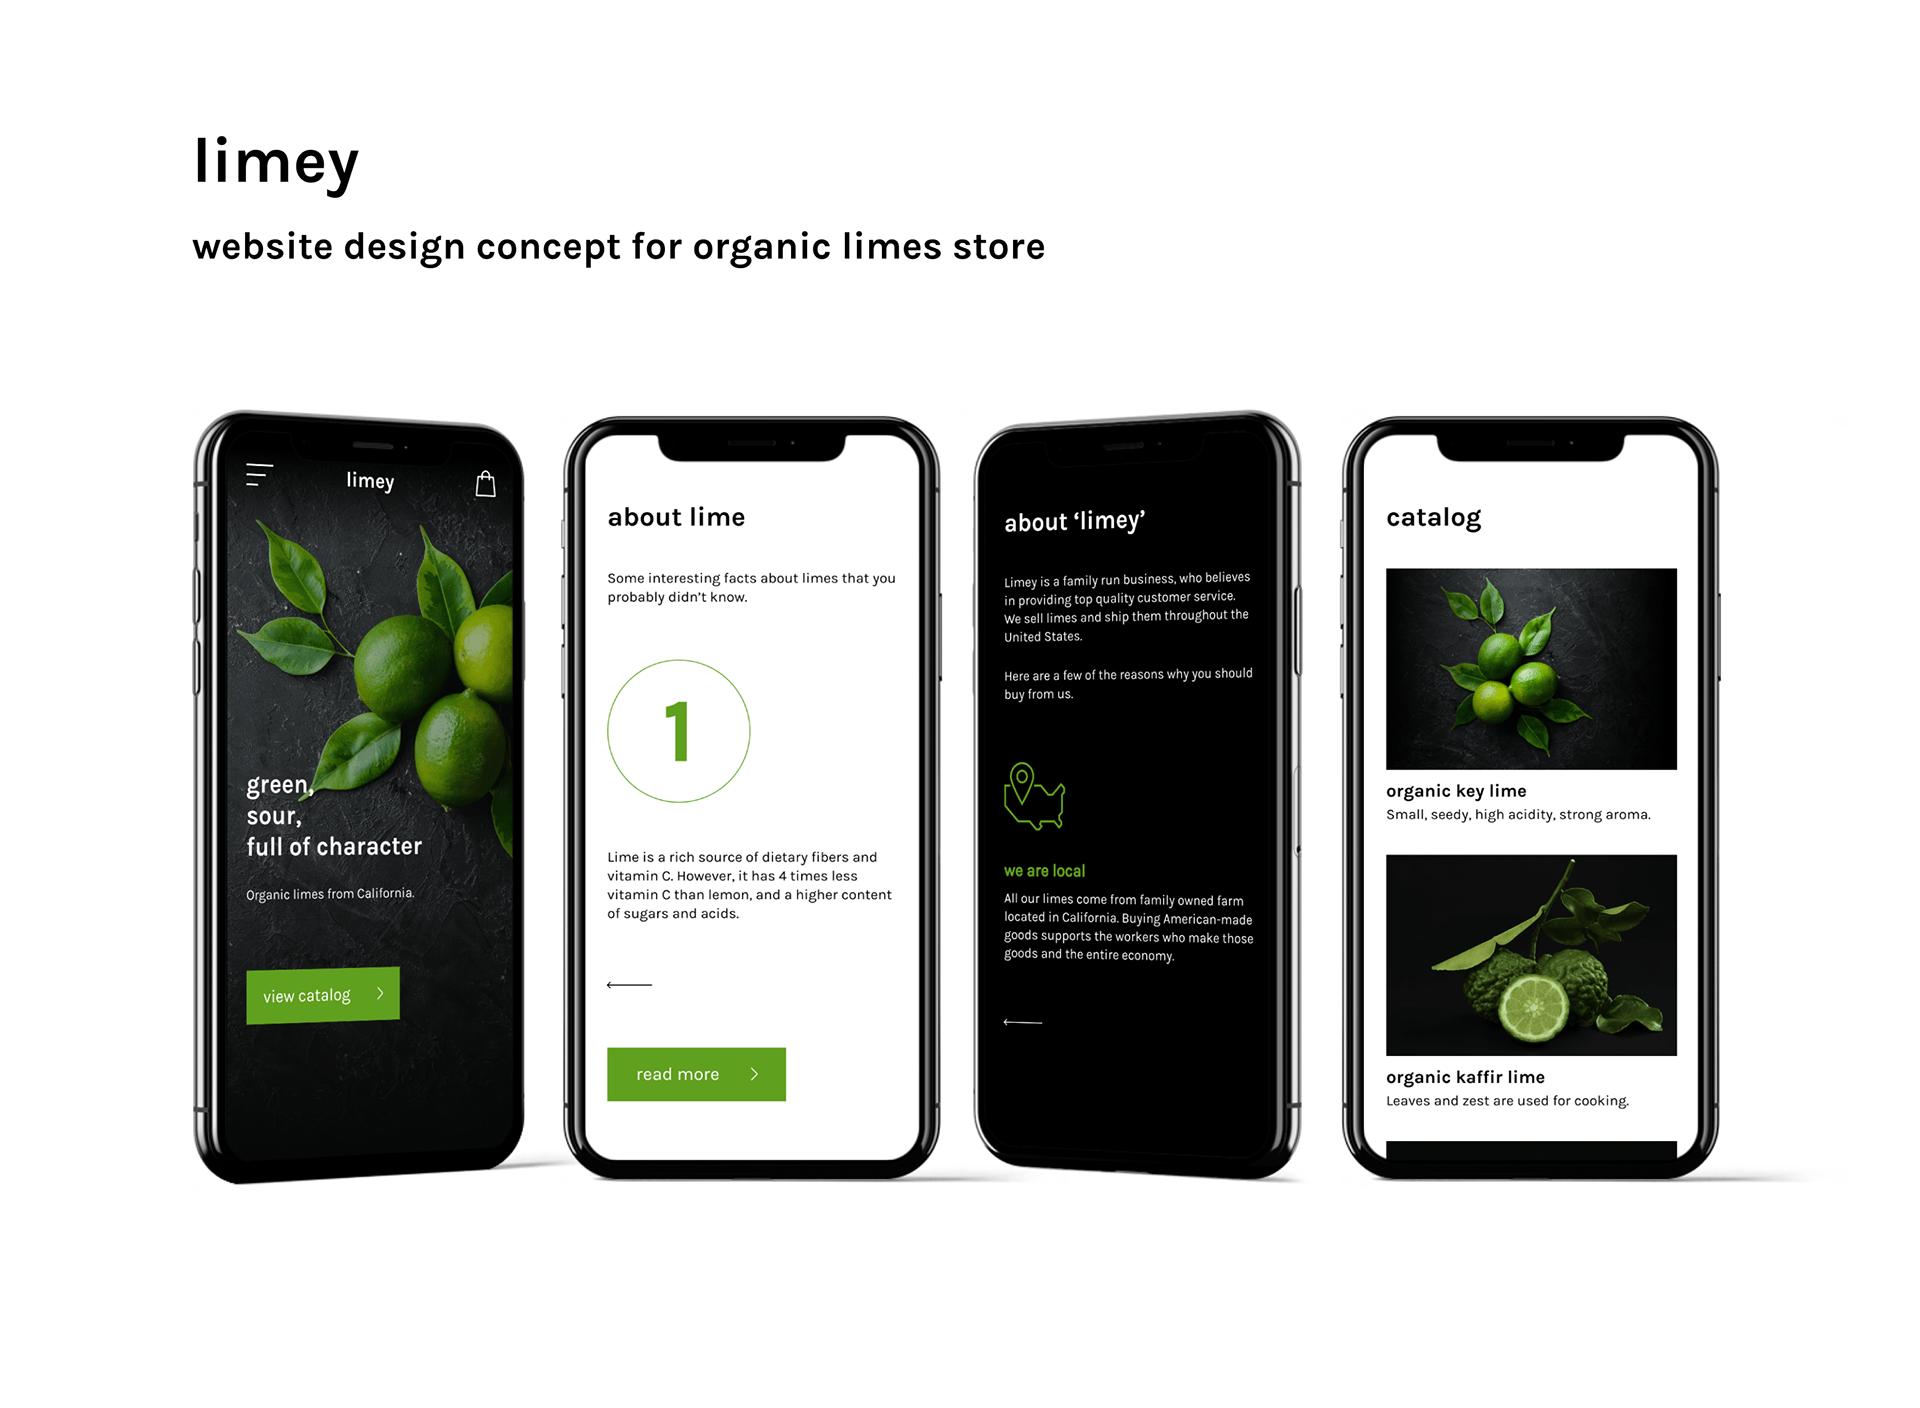 Дизайн сайта интернет-магазина лаймов